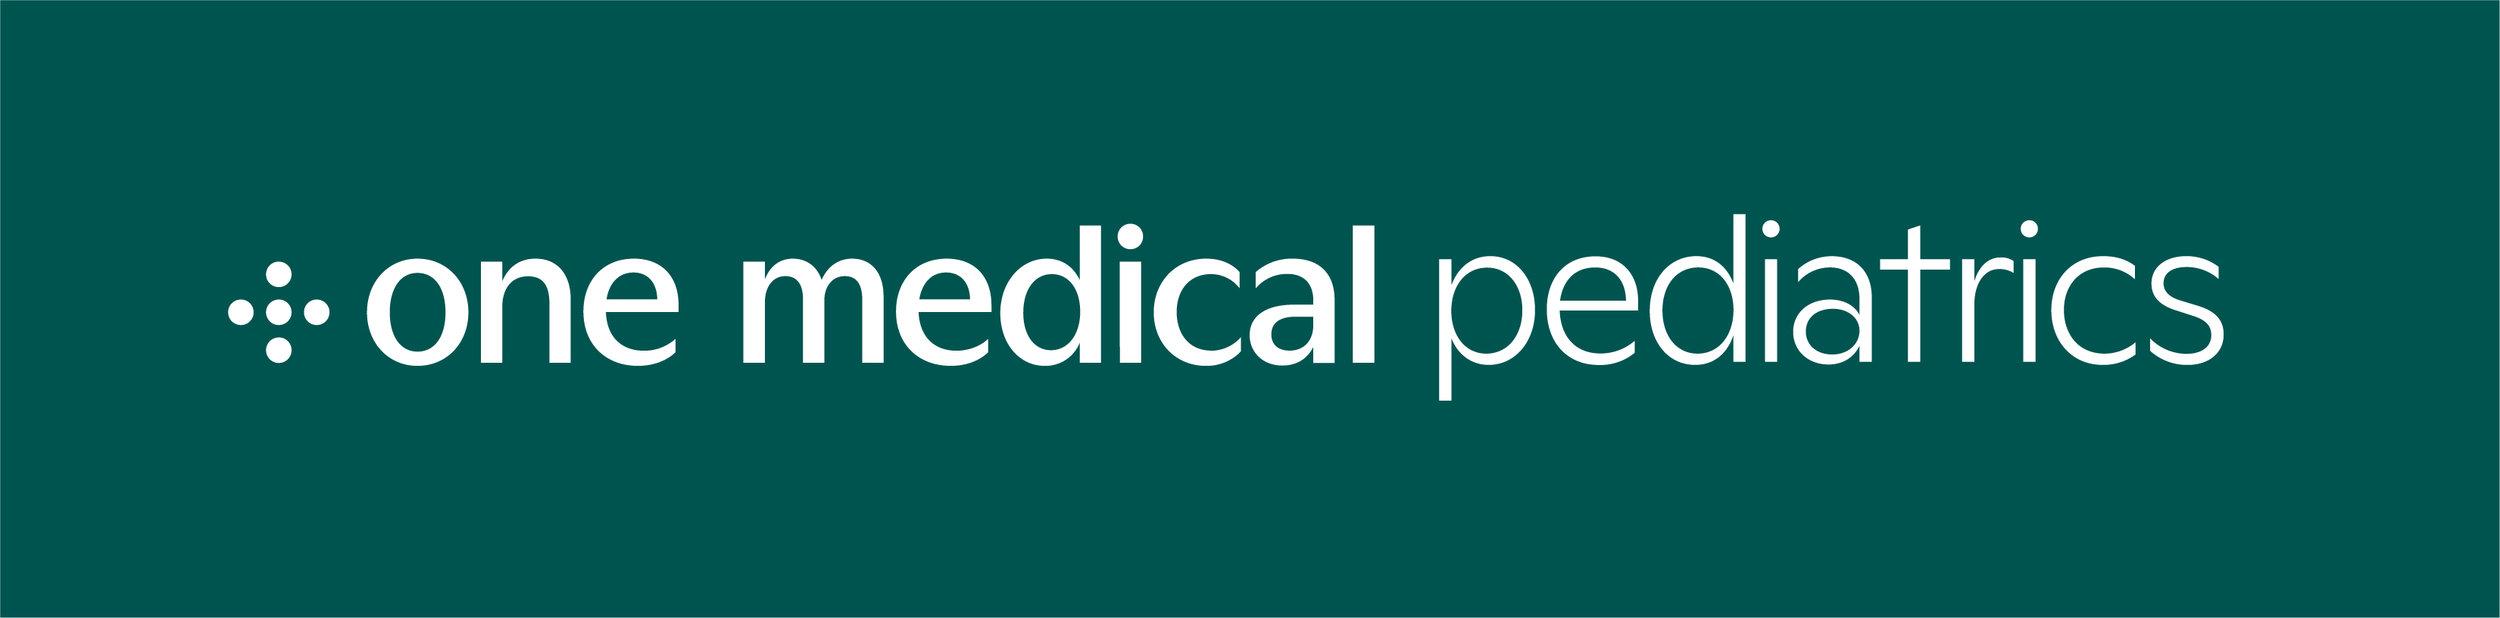 OM Pediatrics@300x-100.jpg